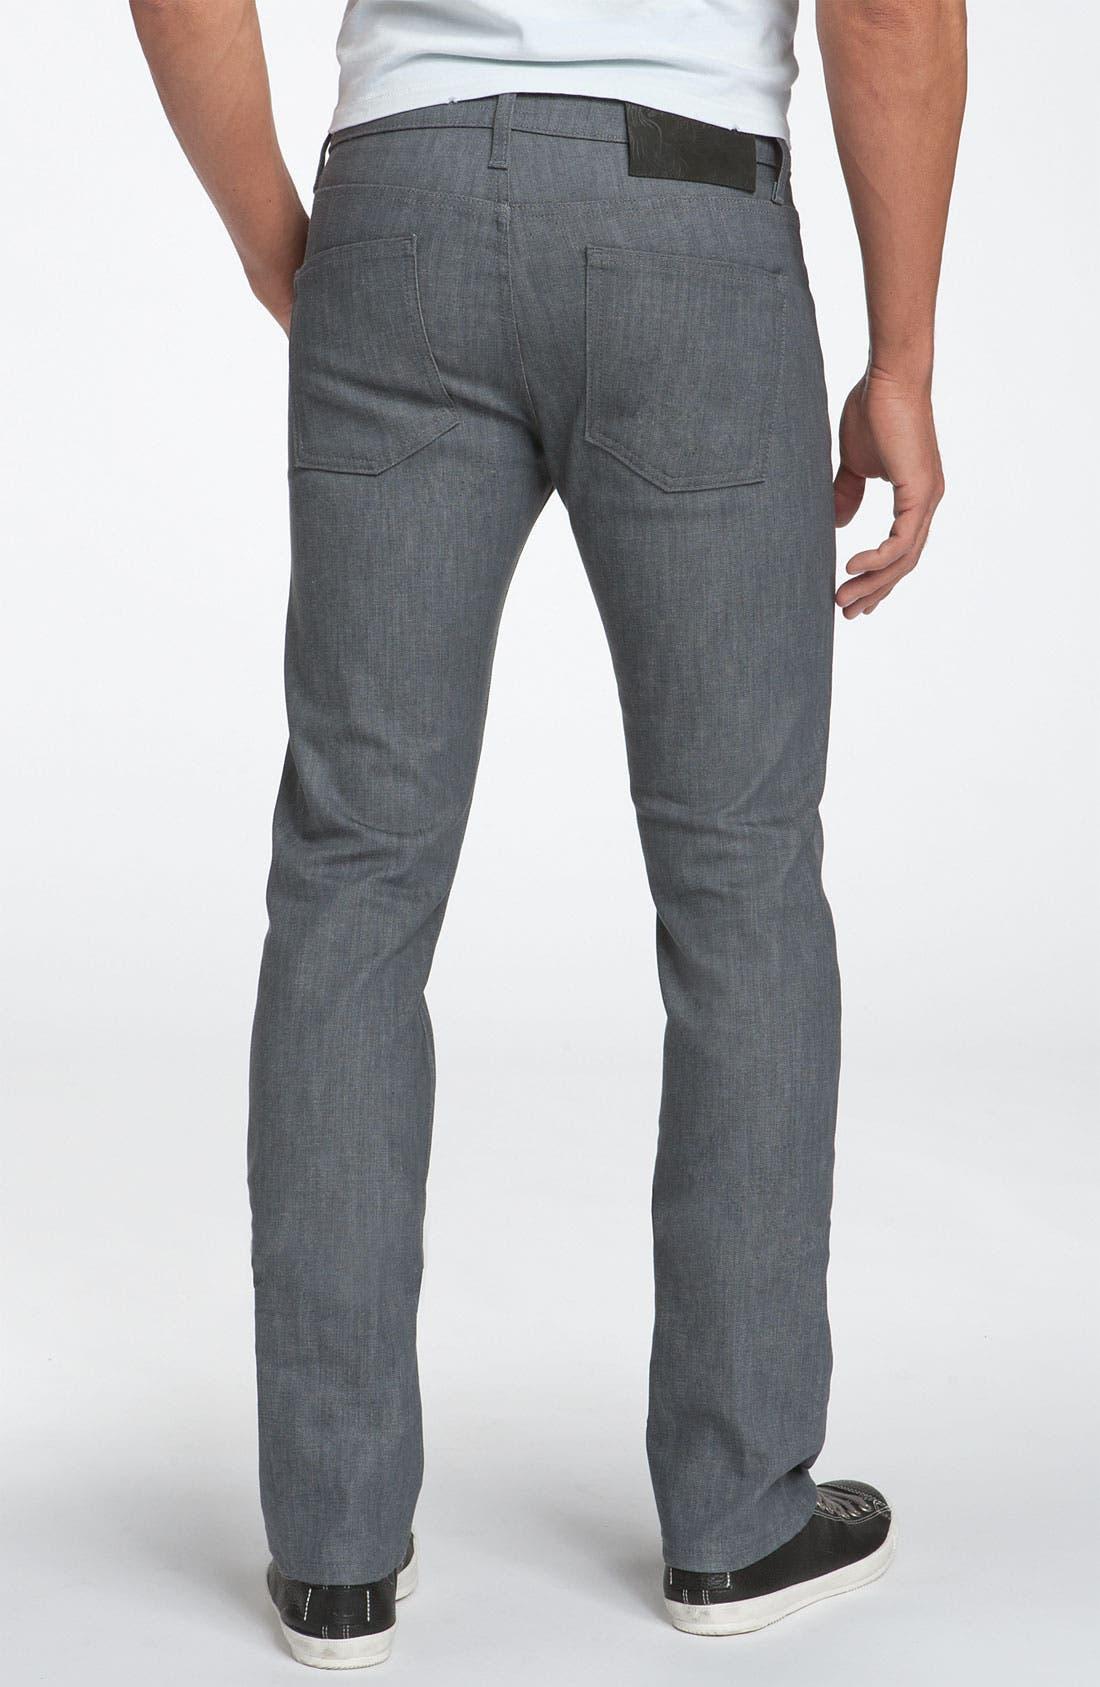 NAKED & FAMOUS DENIM,                             'Skinny Guy' Skinny Fit Jeans,                             Alternate thumbnail 2, color,                             060